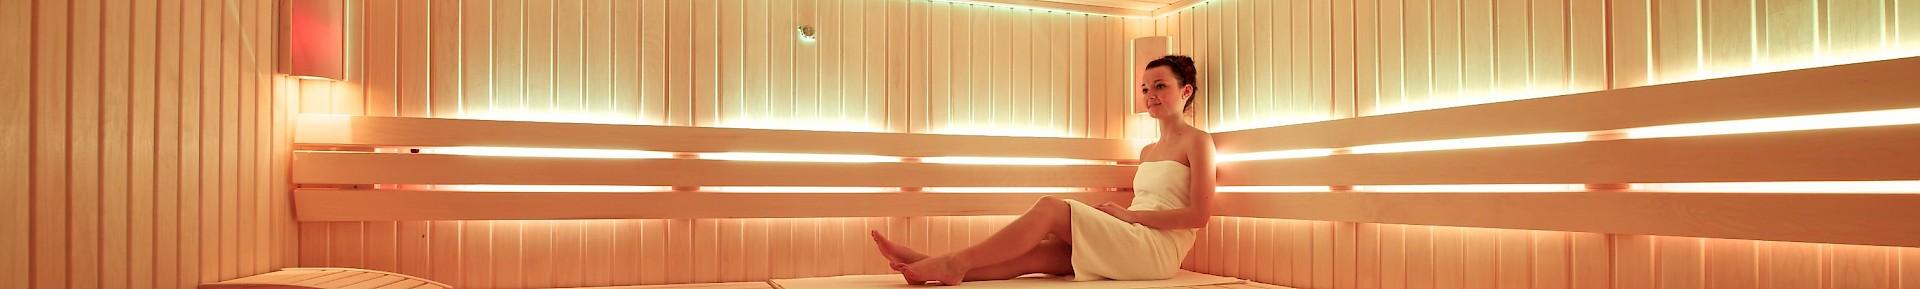 A woman sitting in the sauna